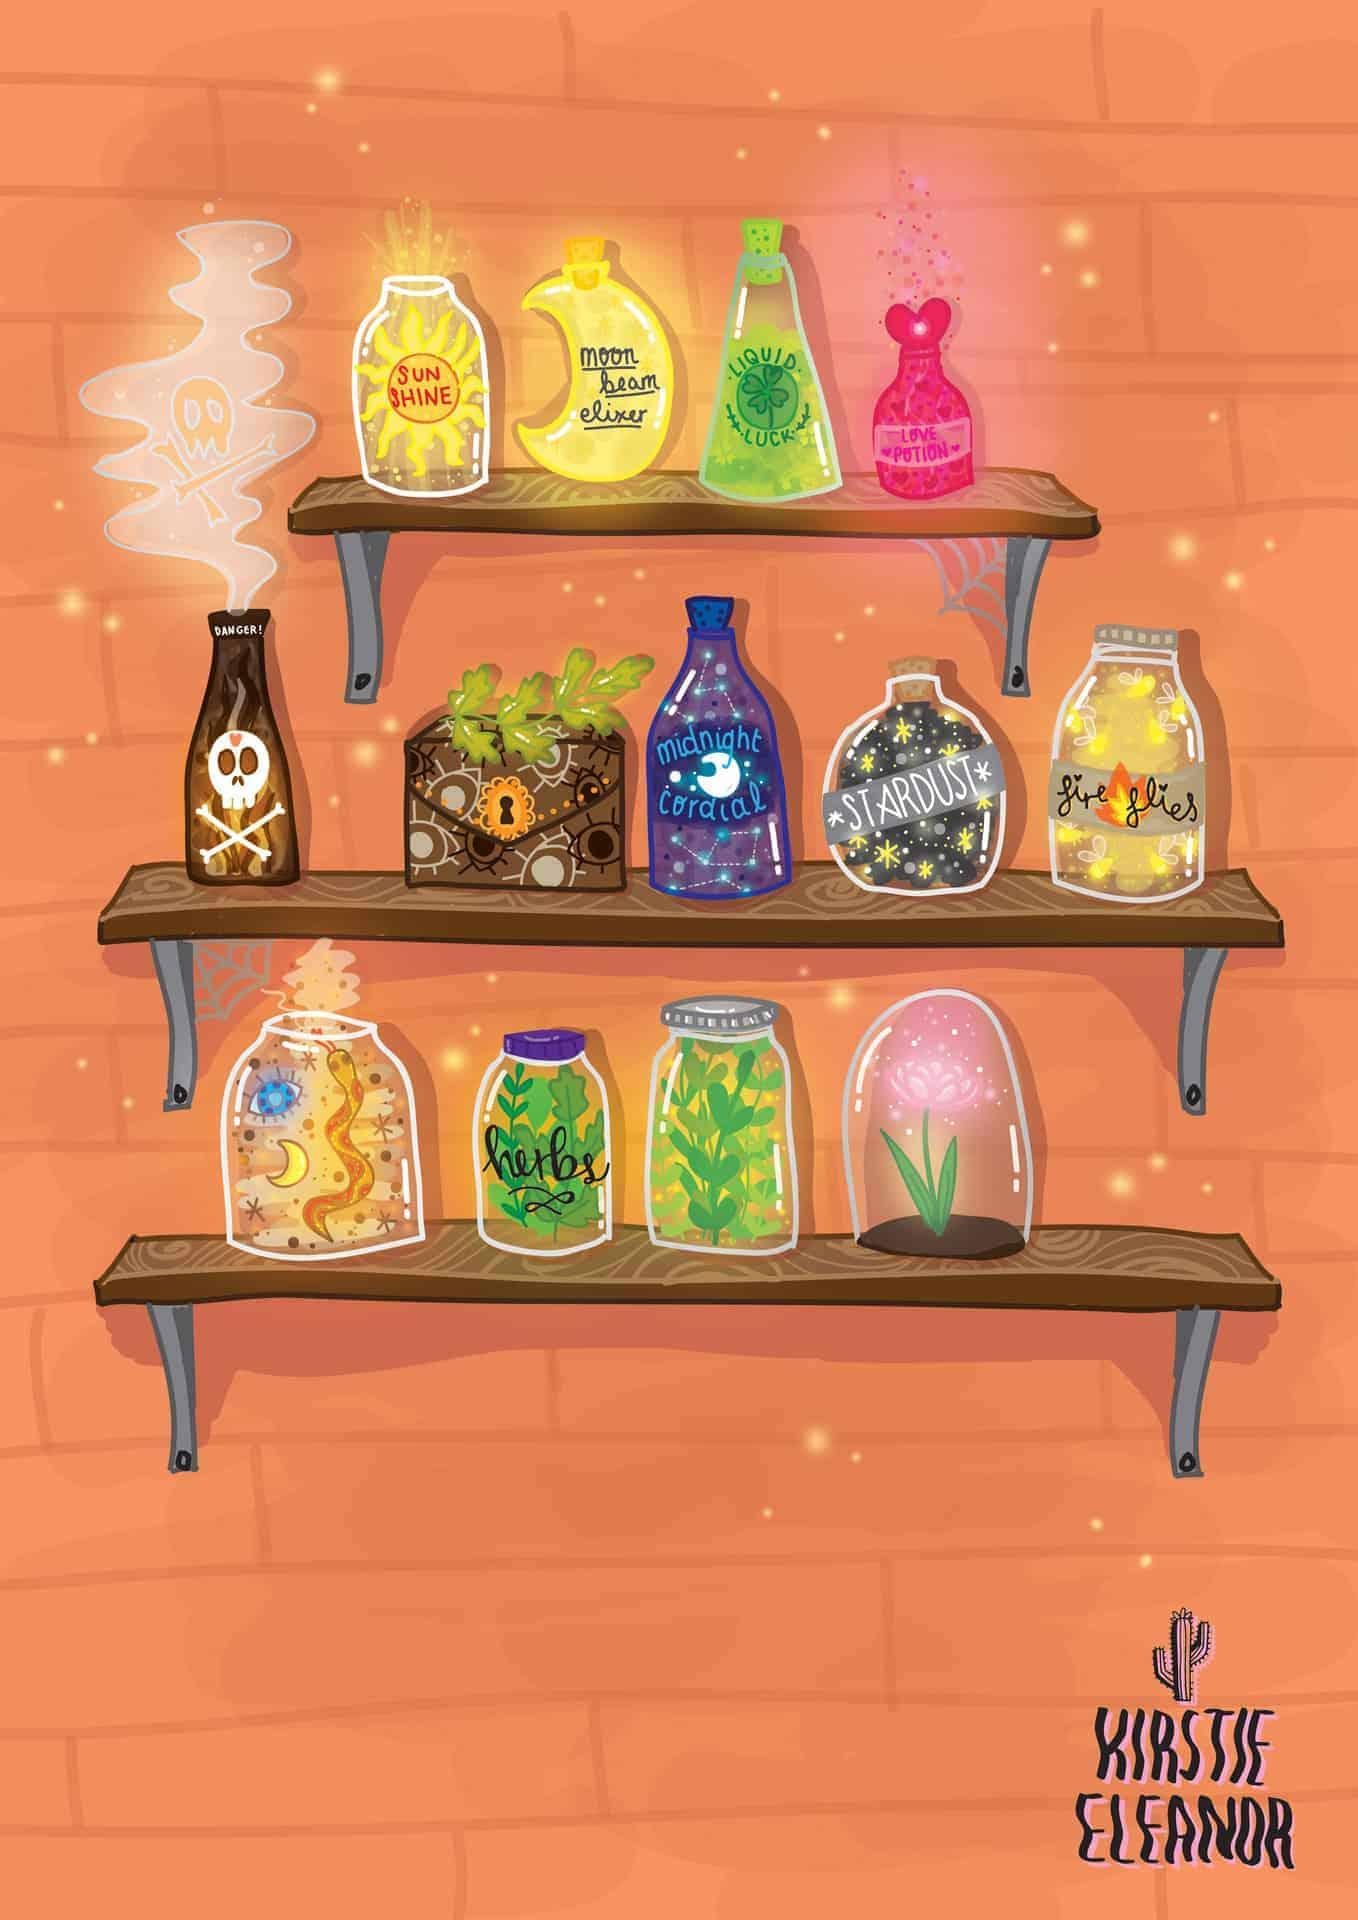 Potion Shelves